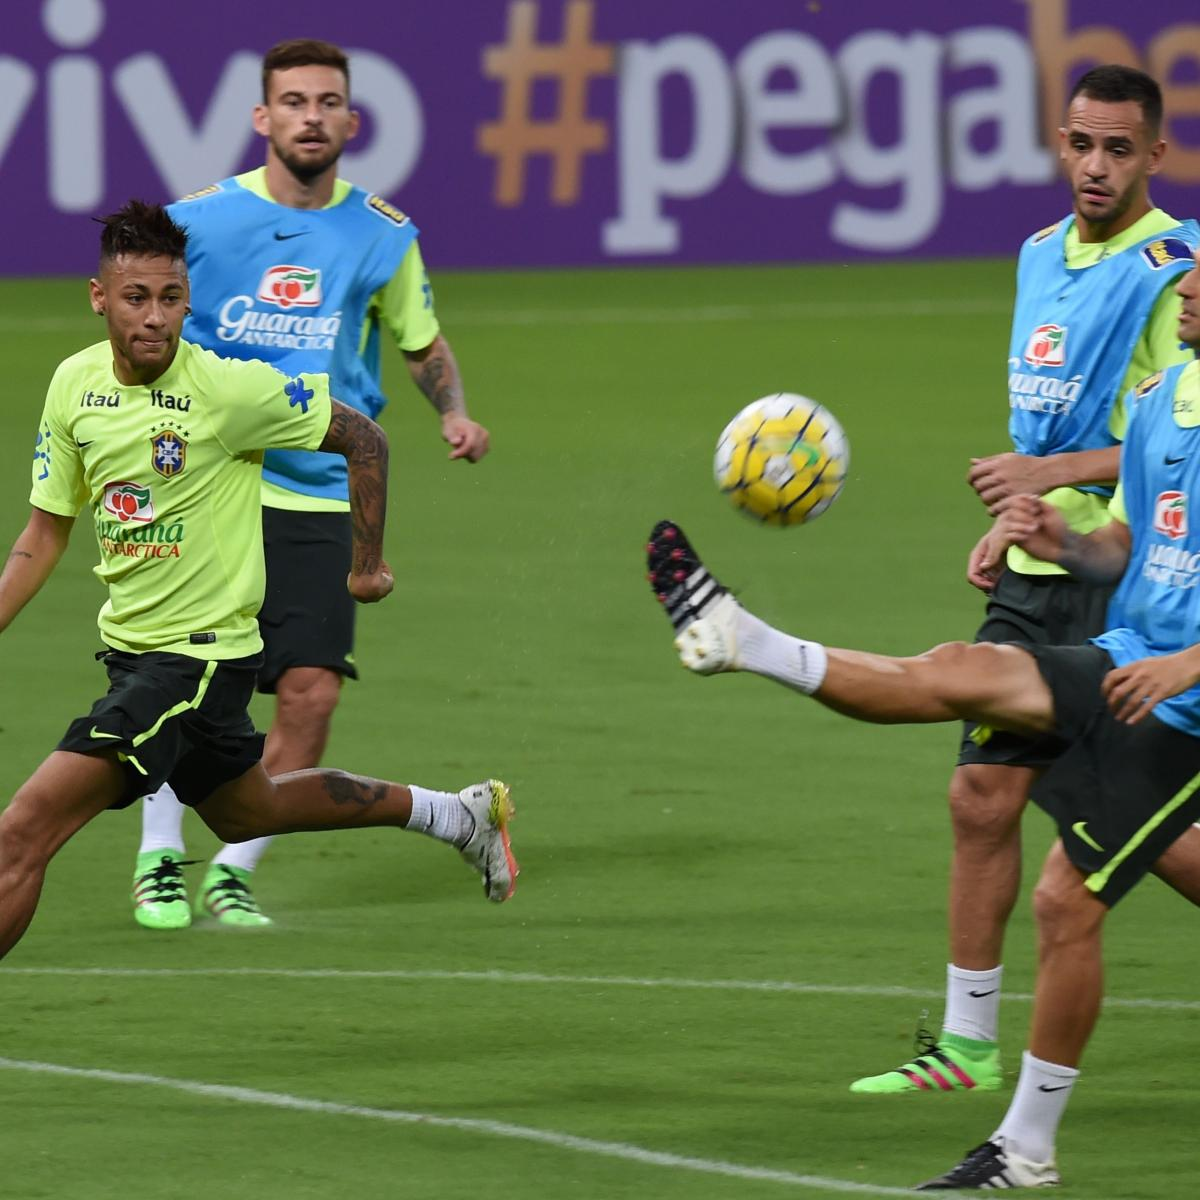 Brazil Vs. Uruguay: Live Score, Highlights From World Cup